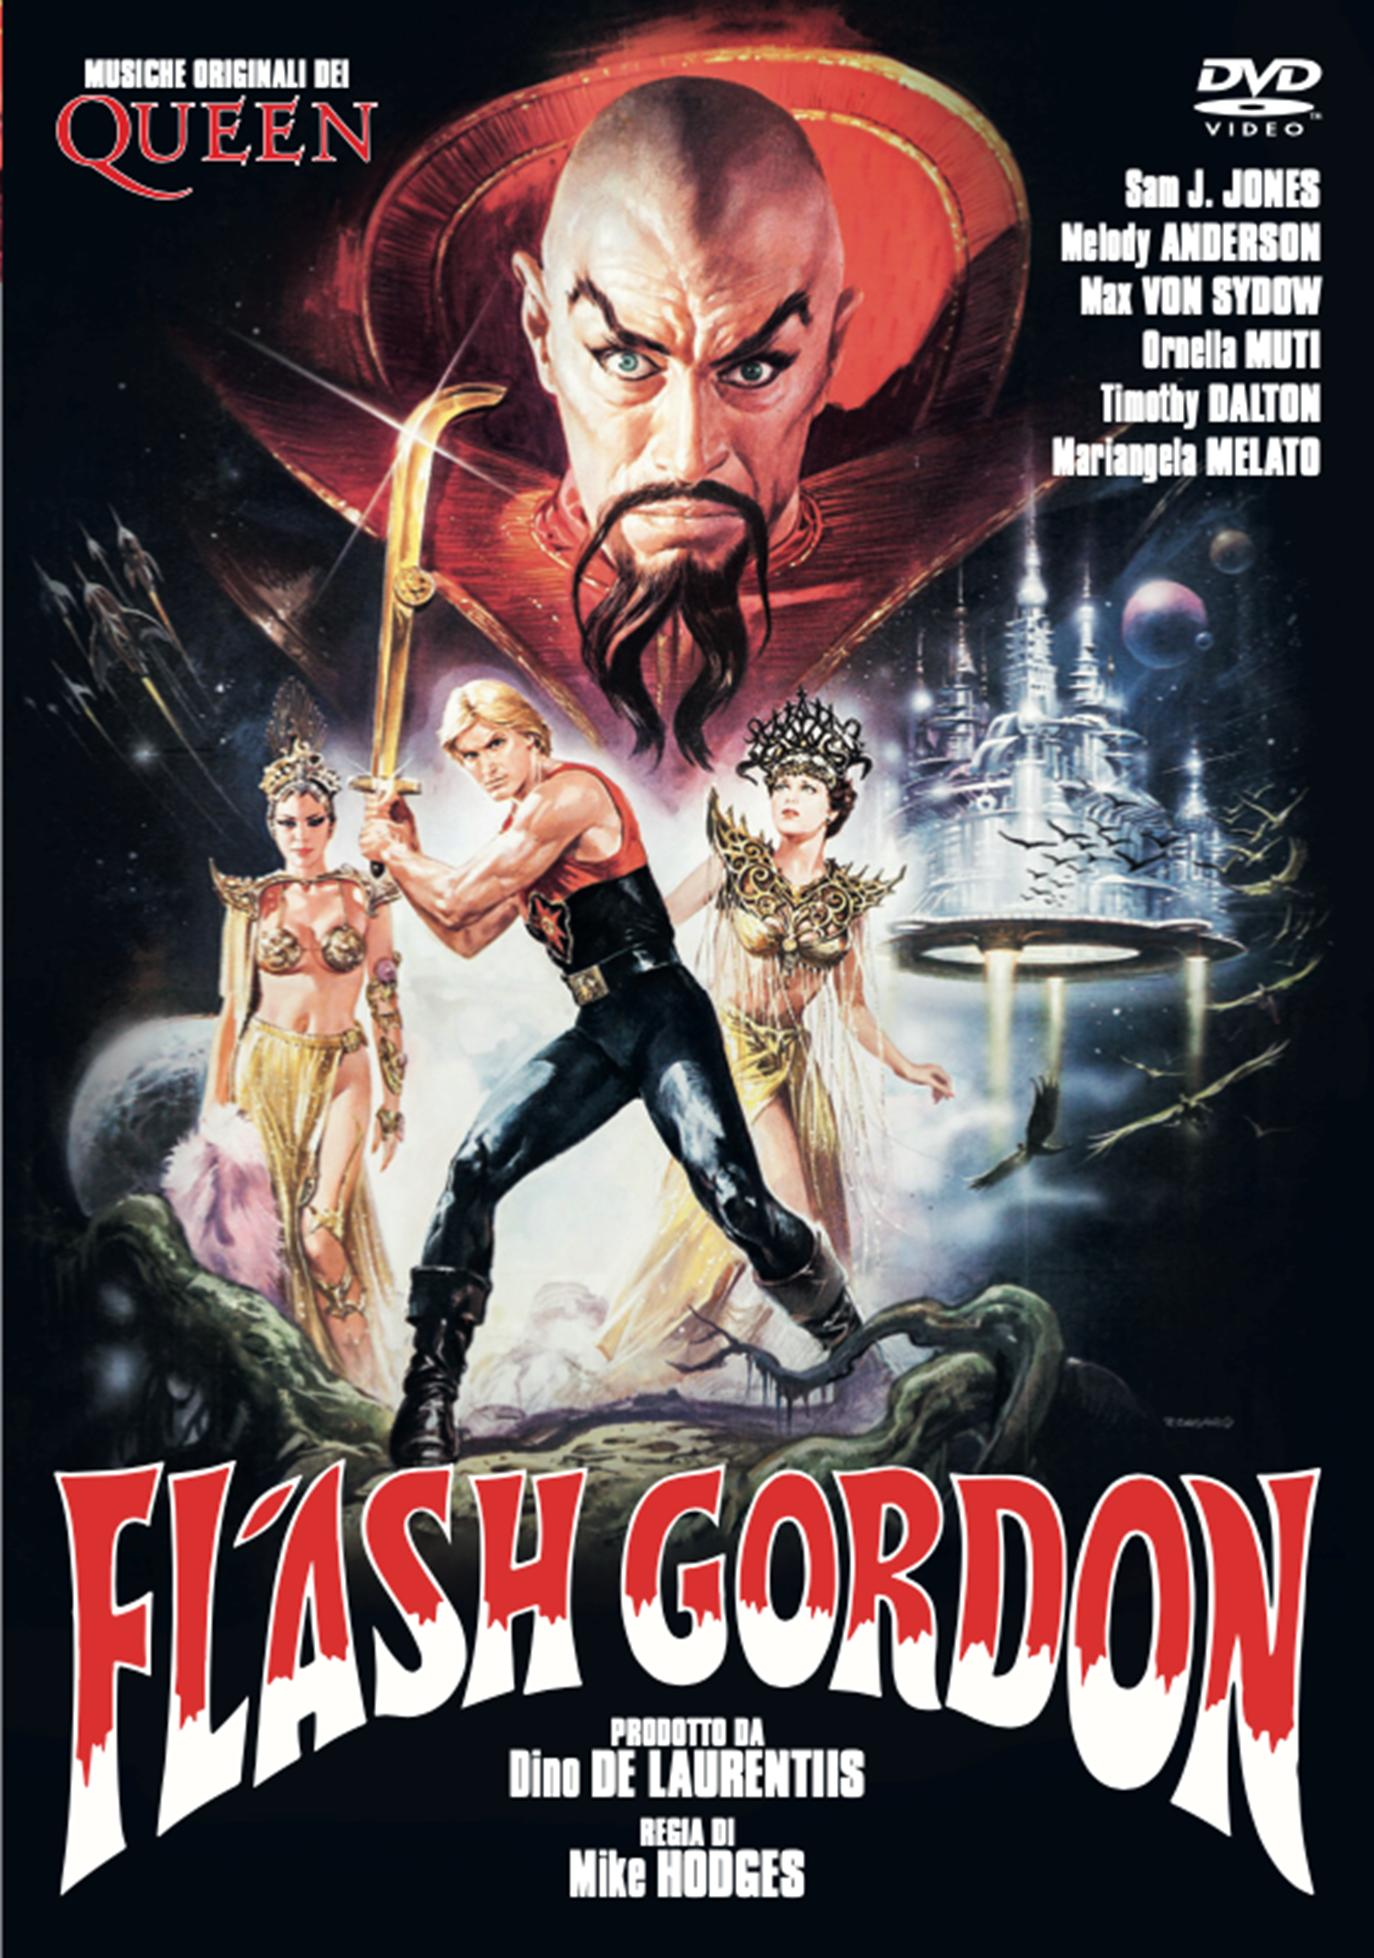 FLASH GORDON - 1980 (DVD)